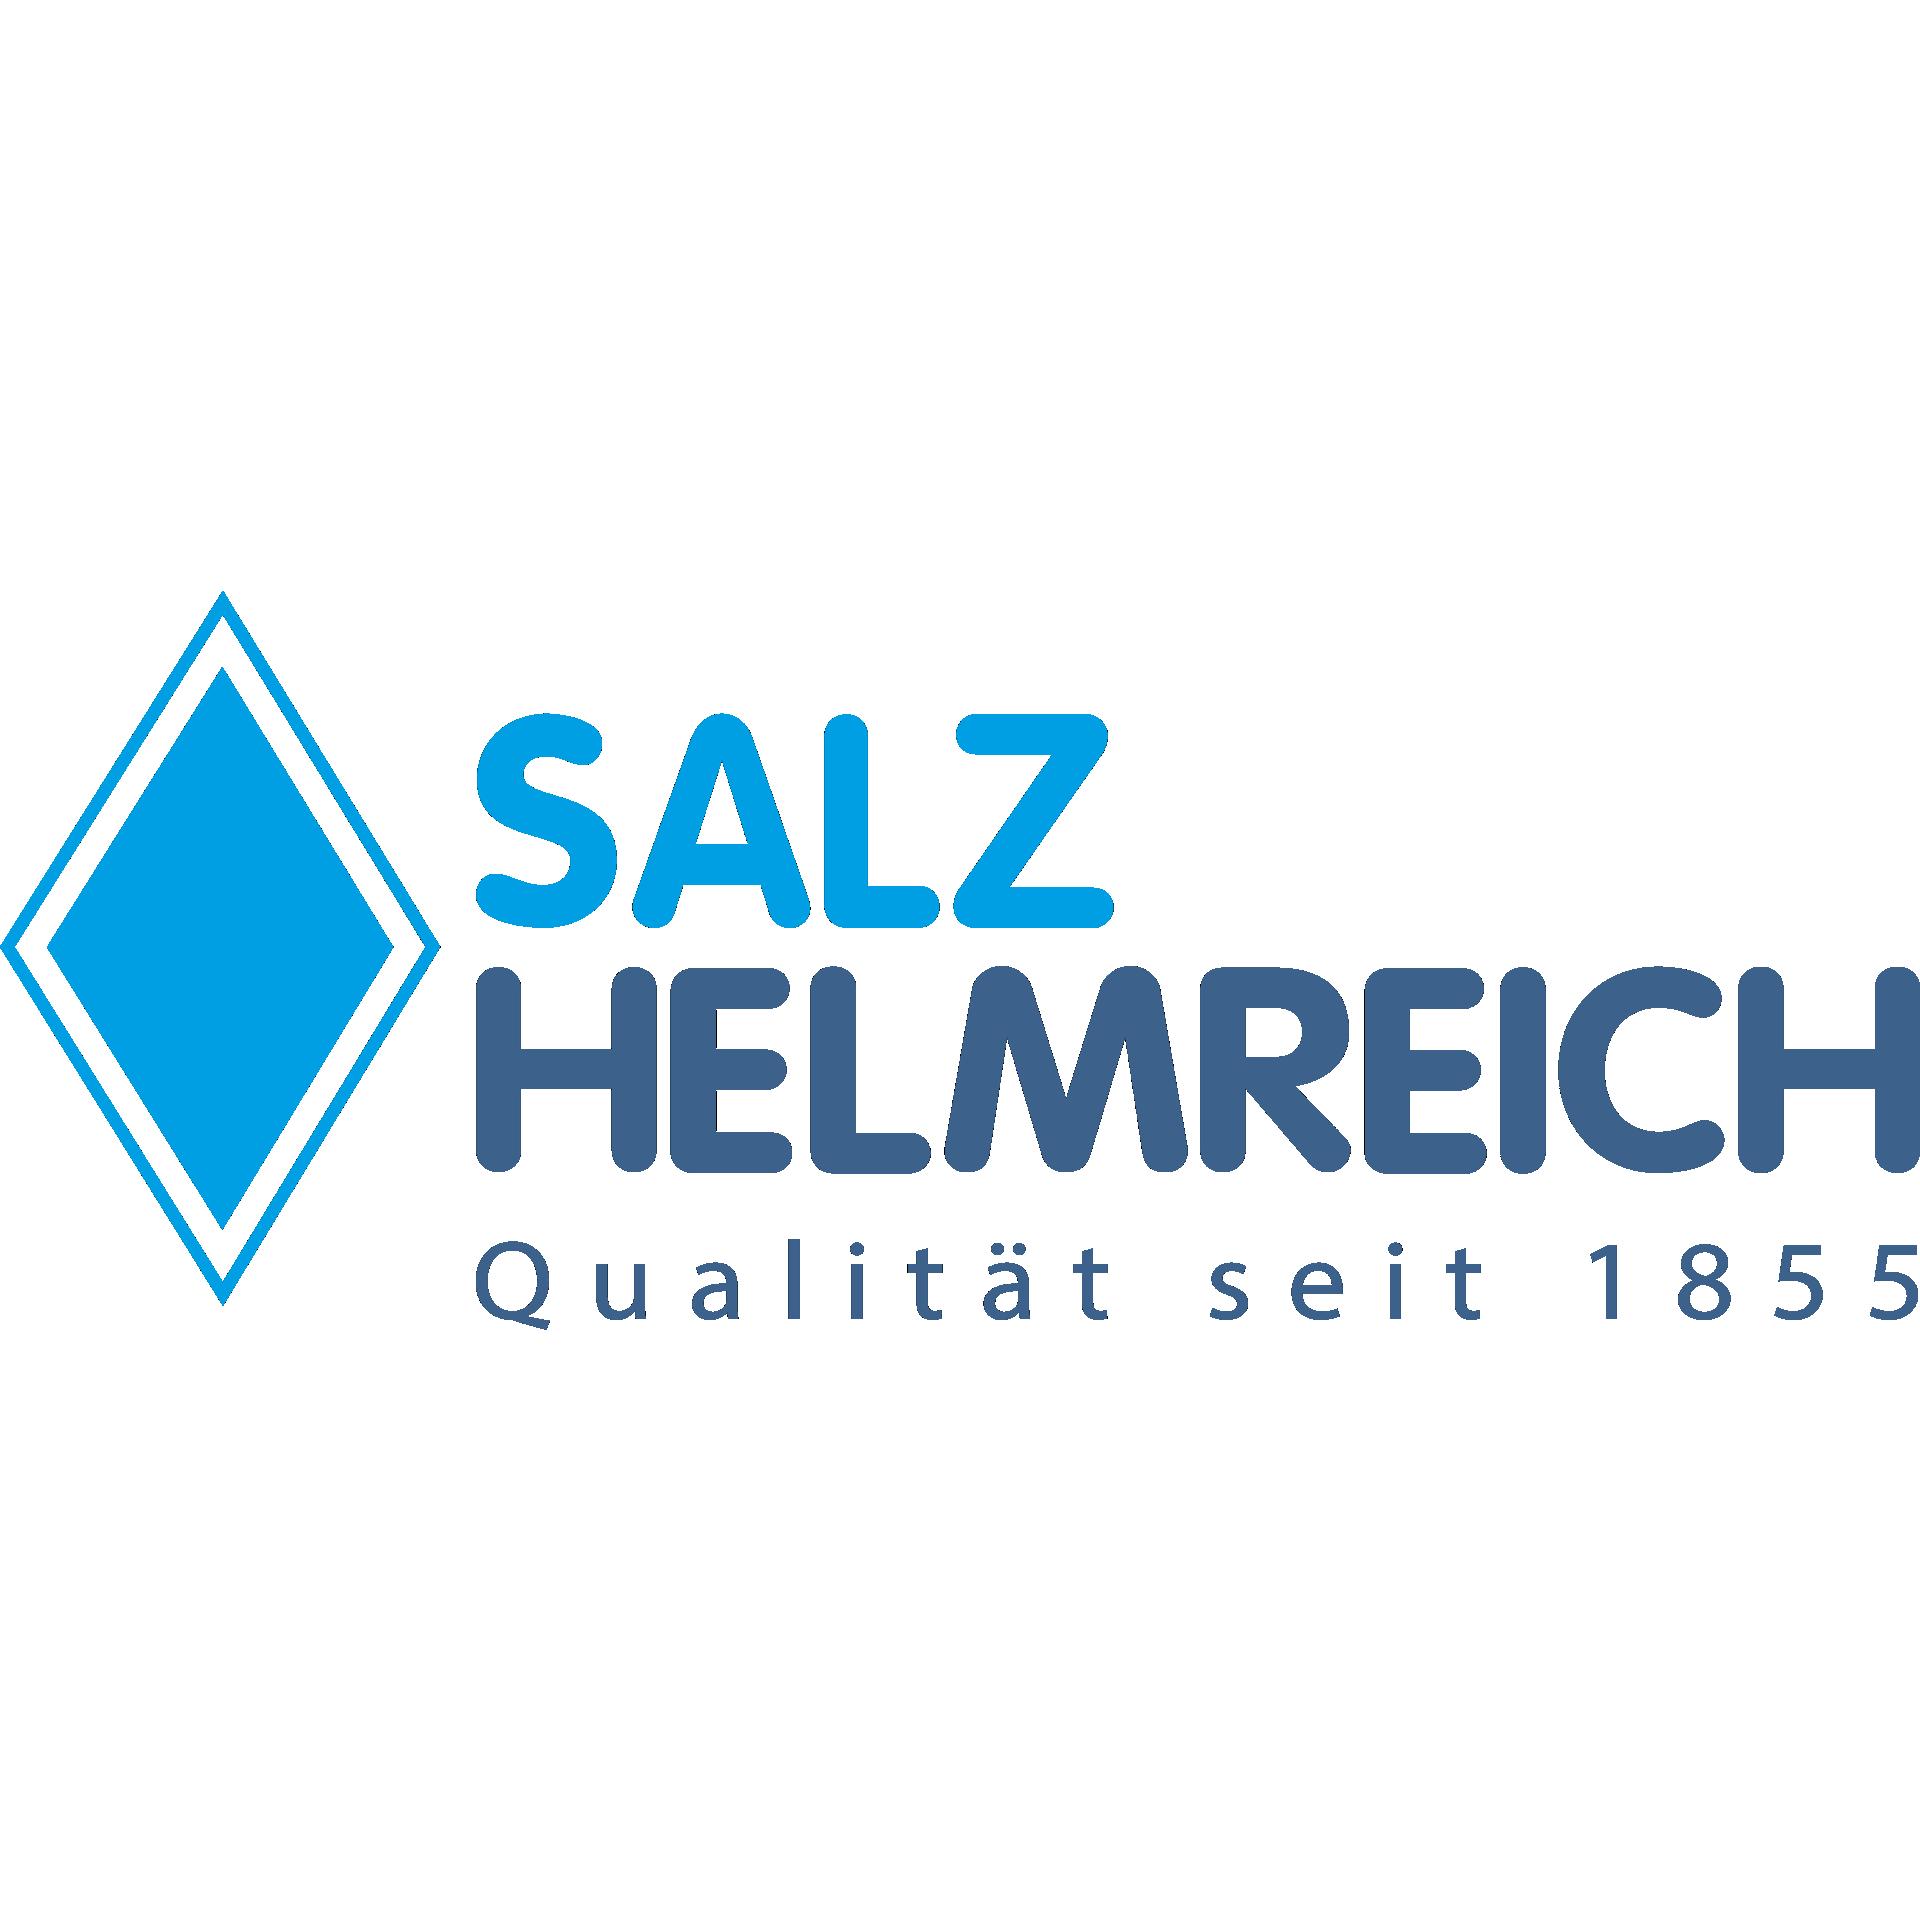 Geschenkset BBQ Salzplatte zum grillen + 1xFleur De Sel mit Knoblauch+Petersilie + 1x GRATIS BBQ Chips